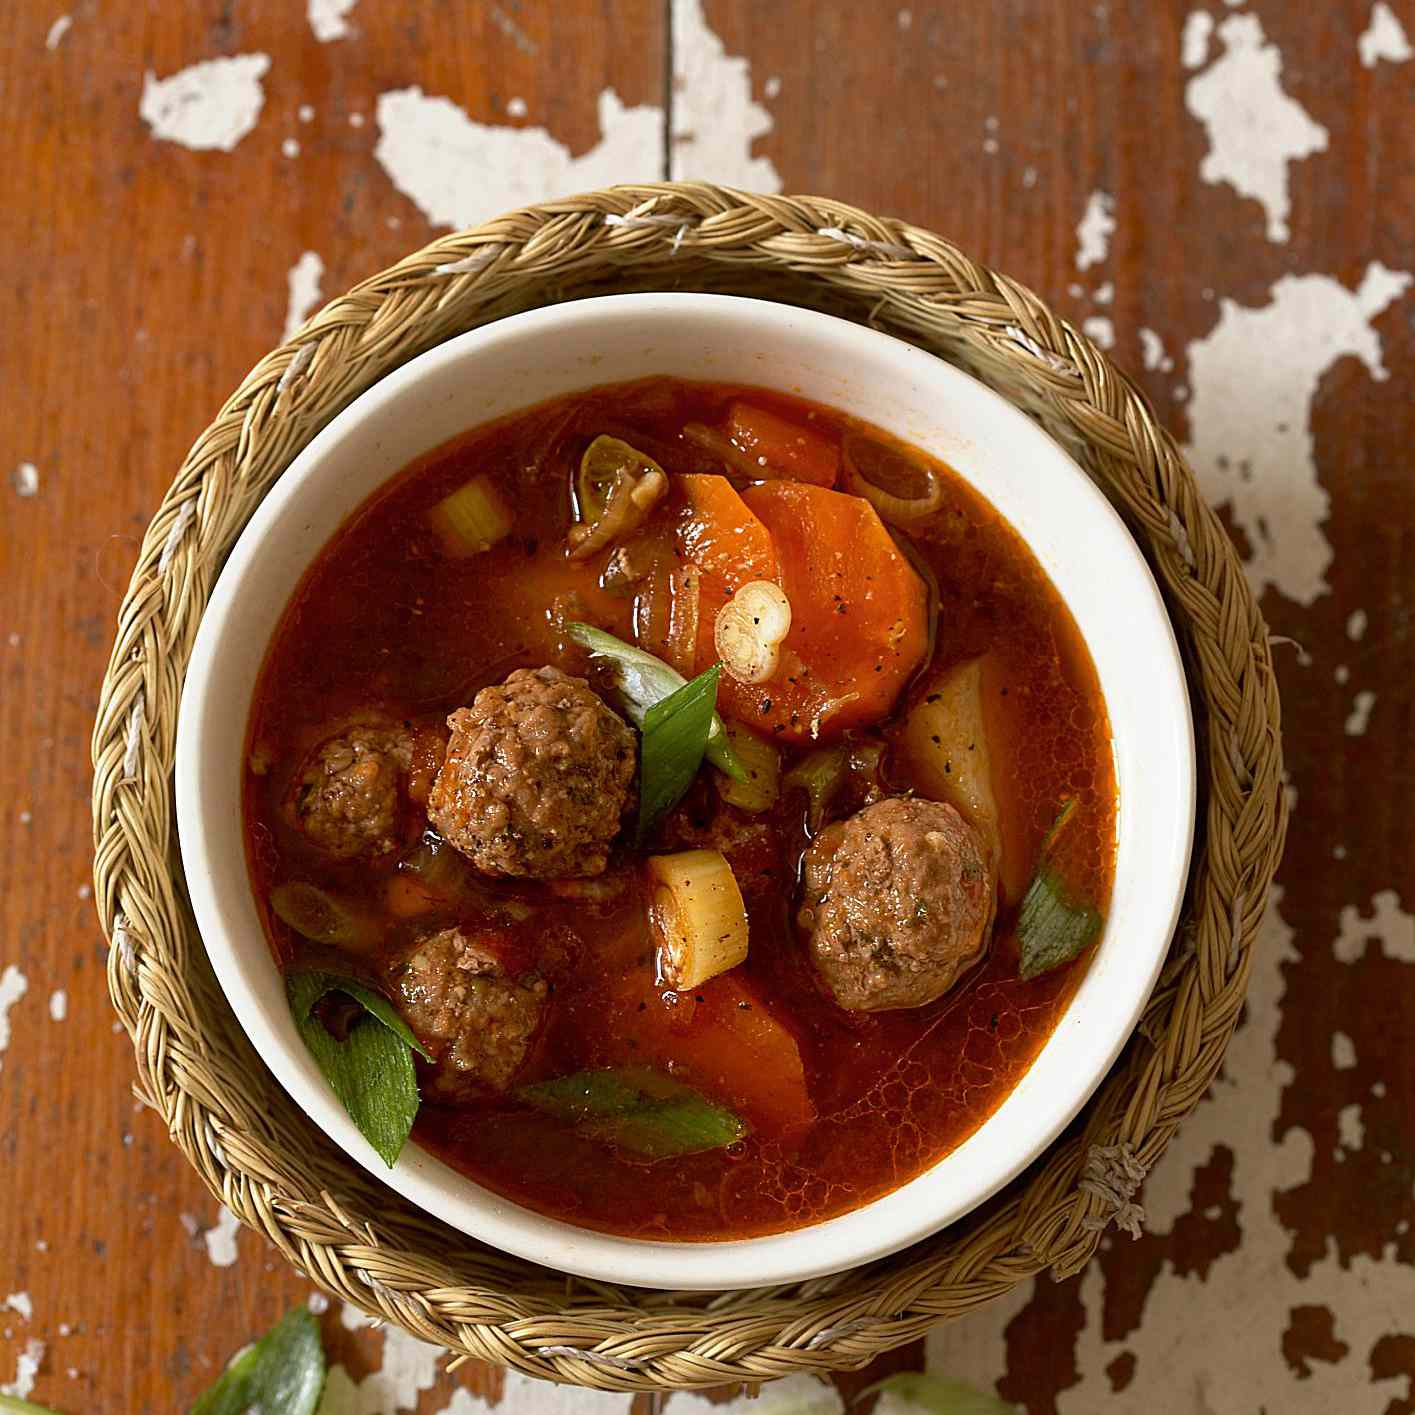 Easy Crock Pot Meatball Soup